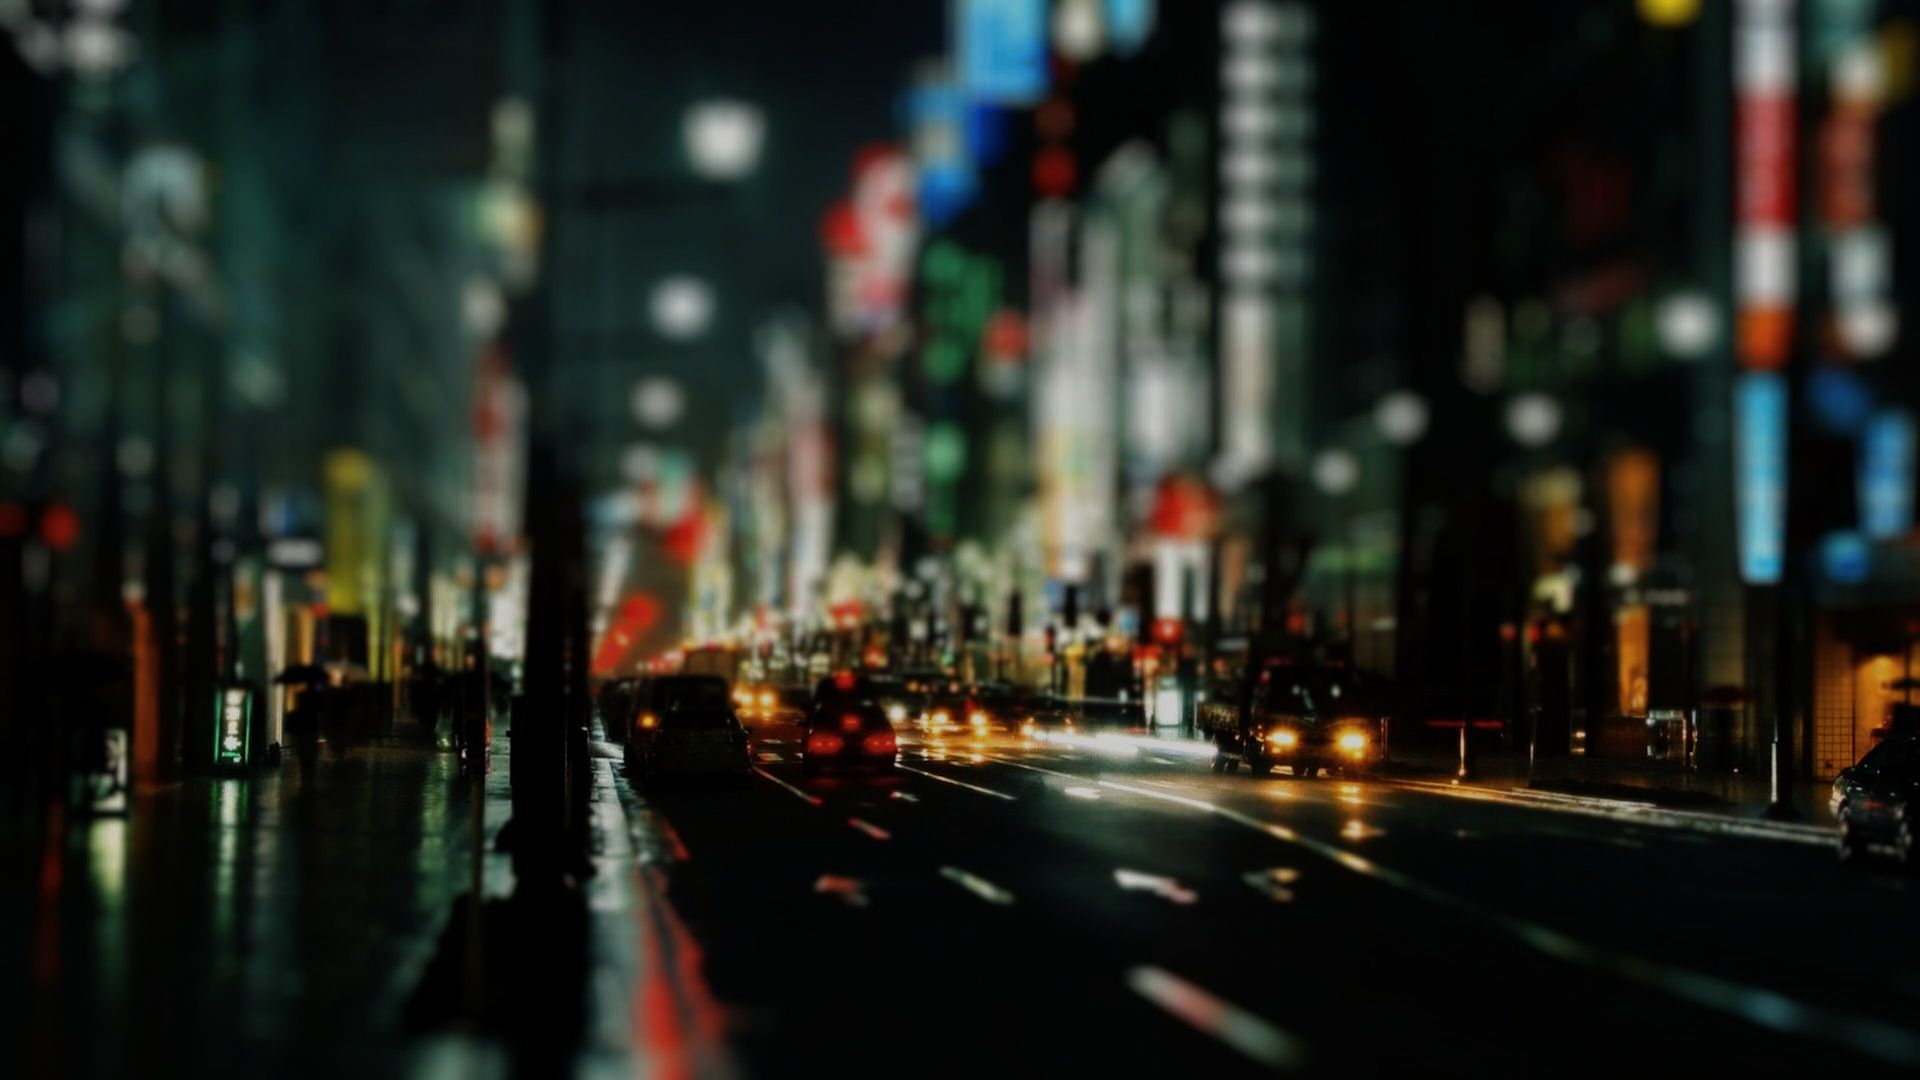 City Hazy Blurred Unsharp Night Rain 1920x1080 Jpeg 1 920